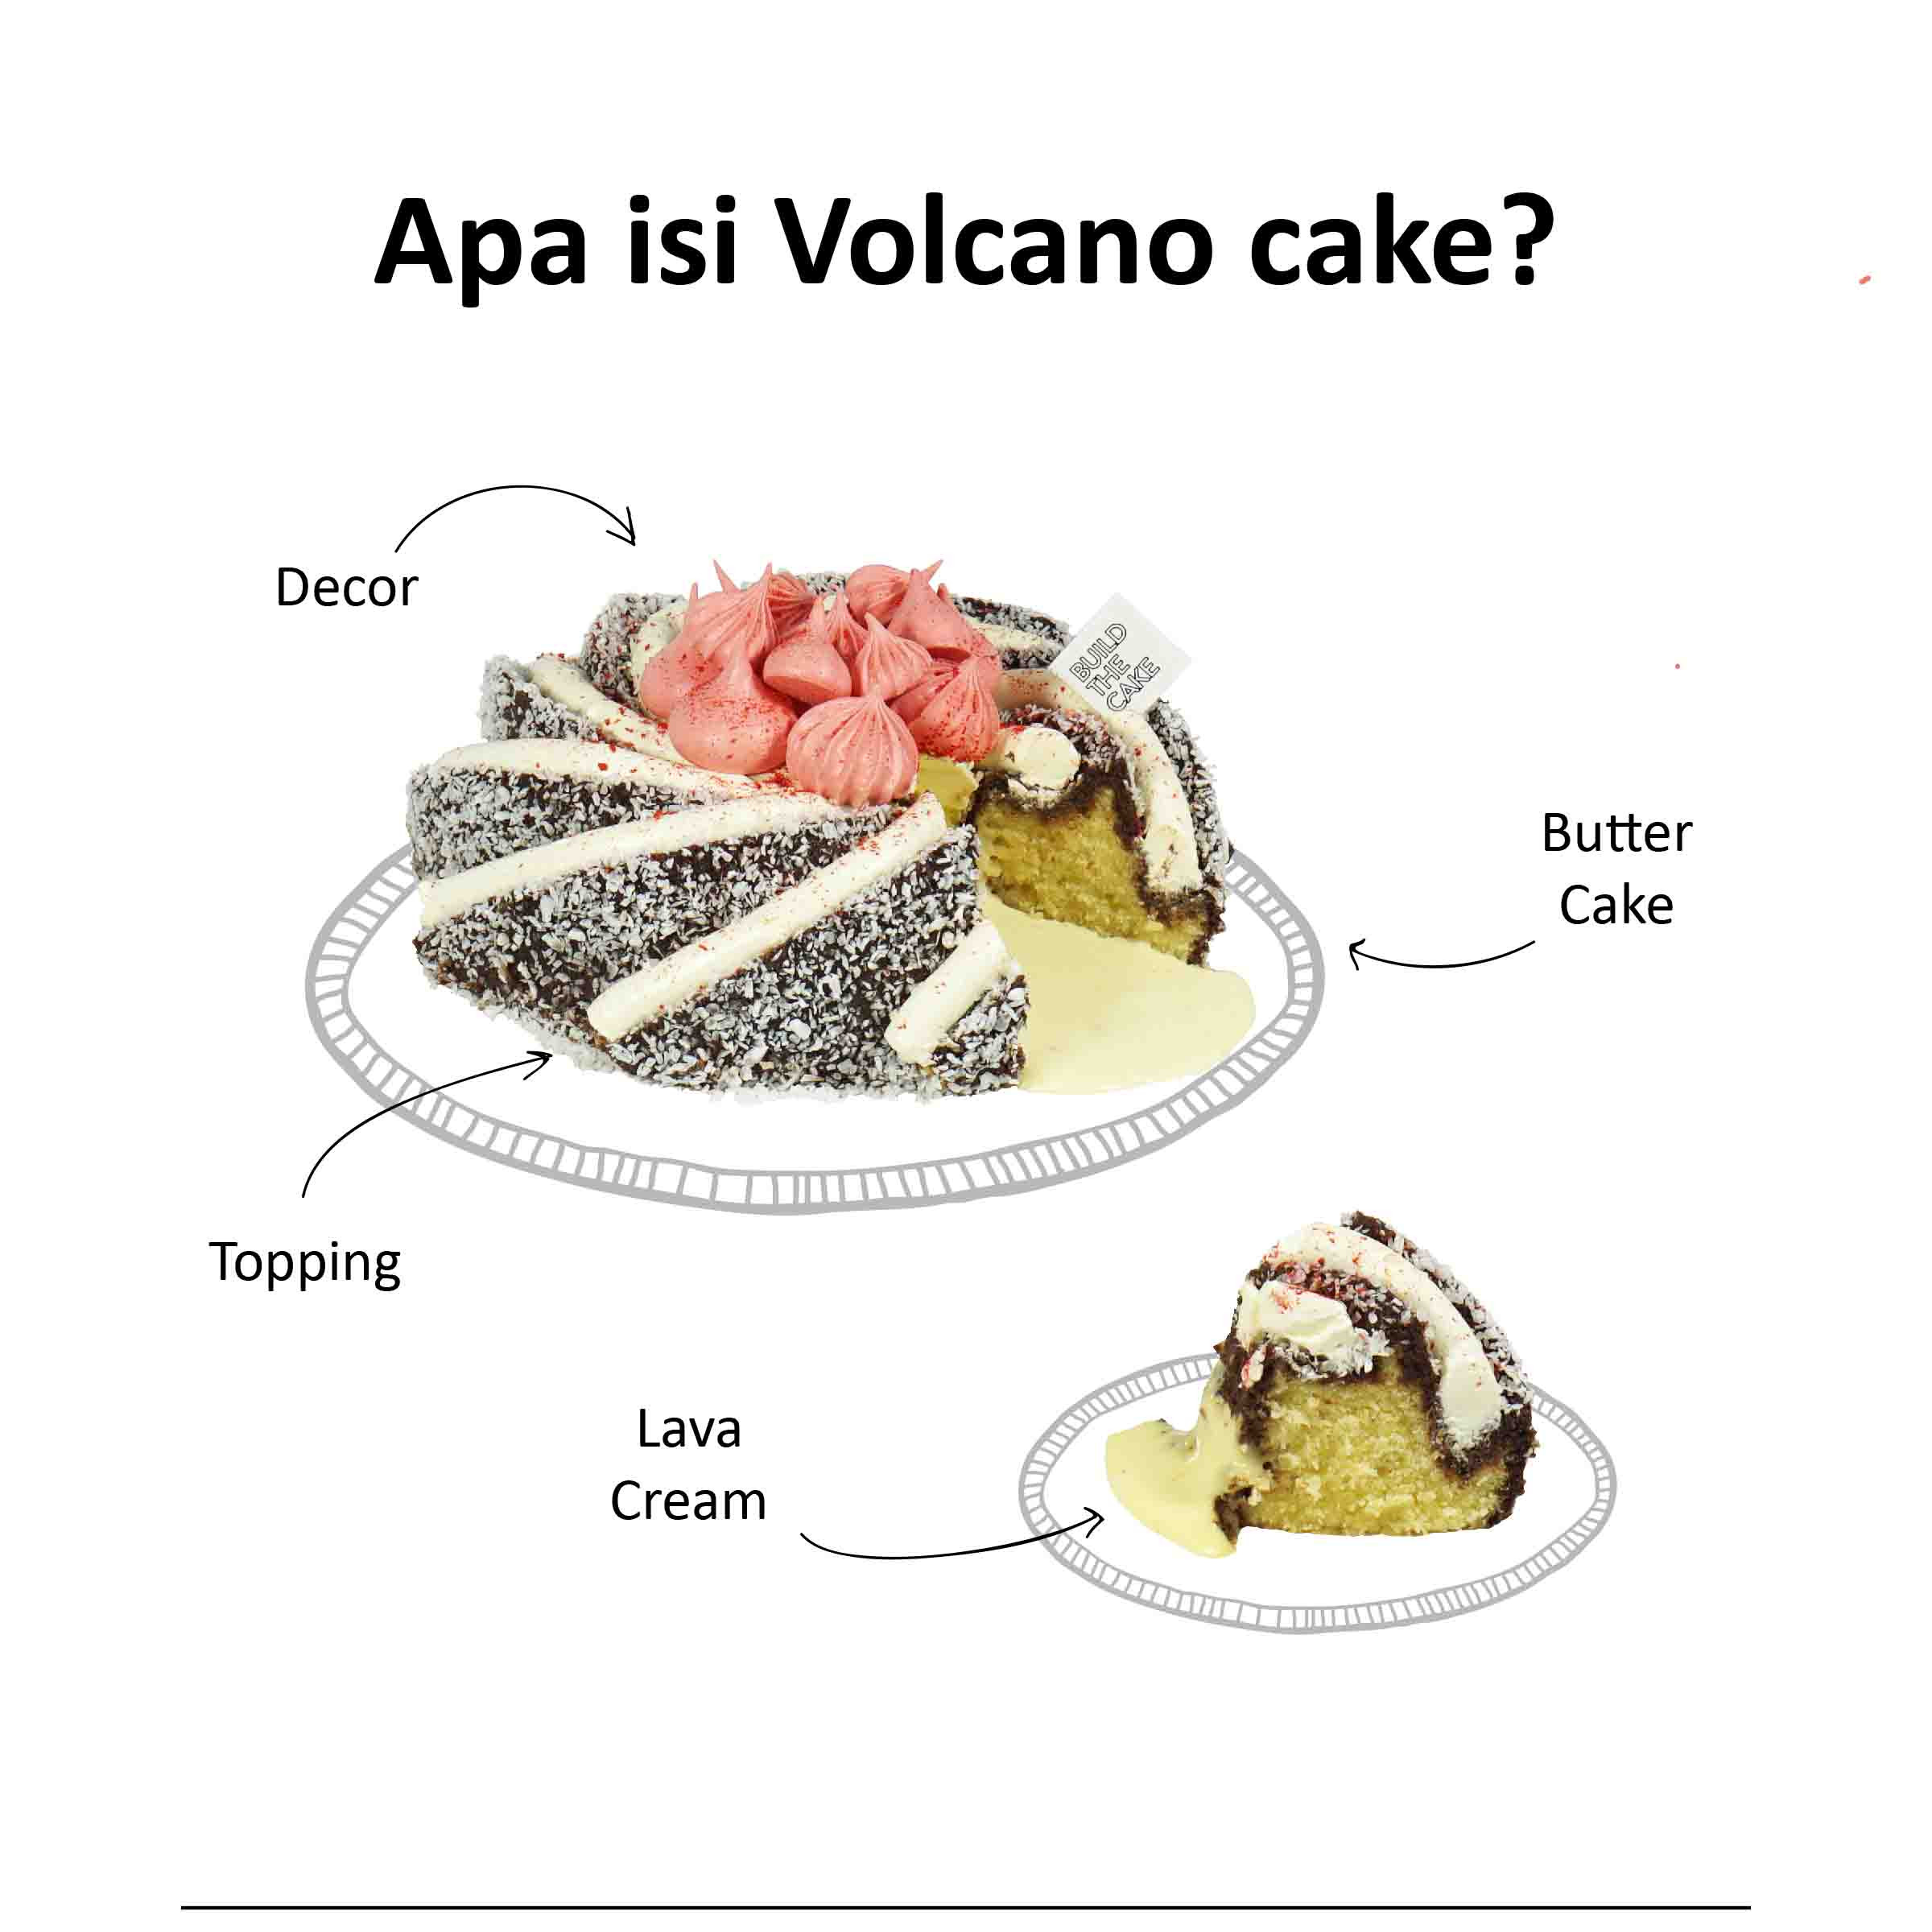 Apa isi Volcano cake?